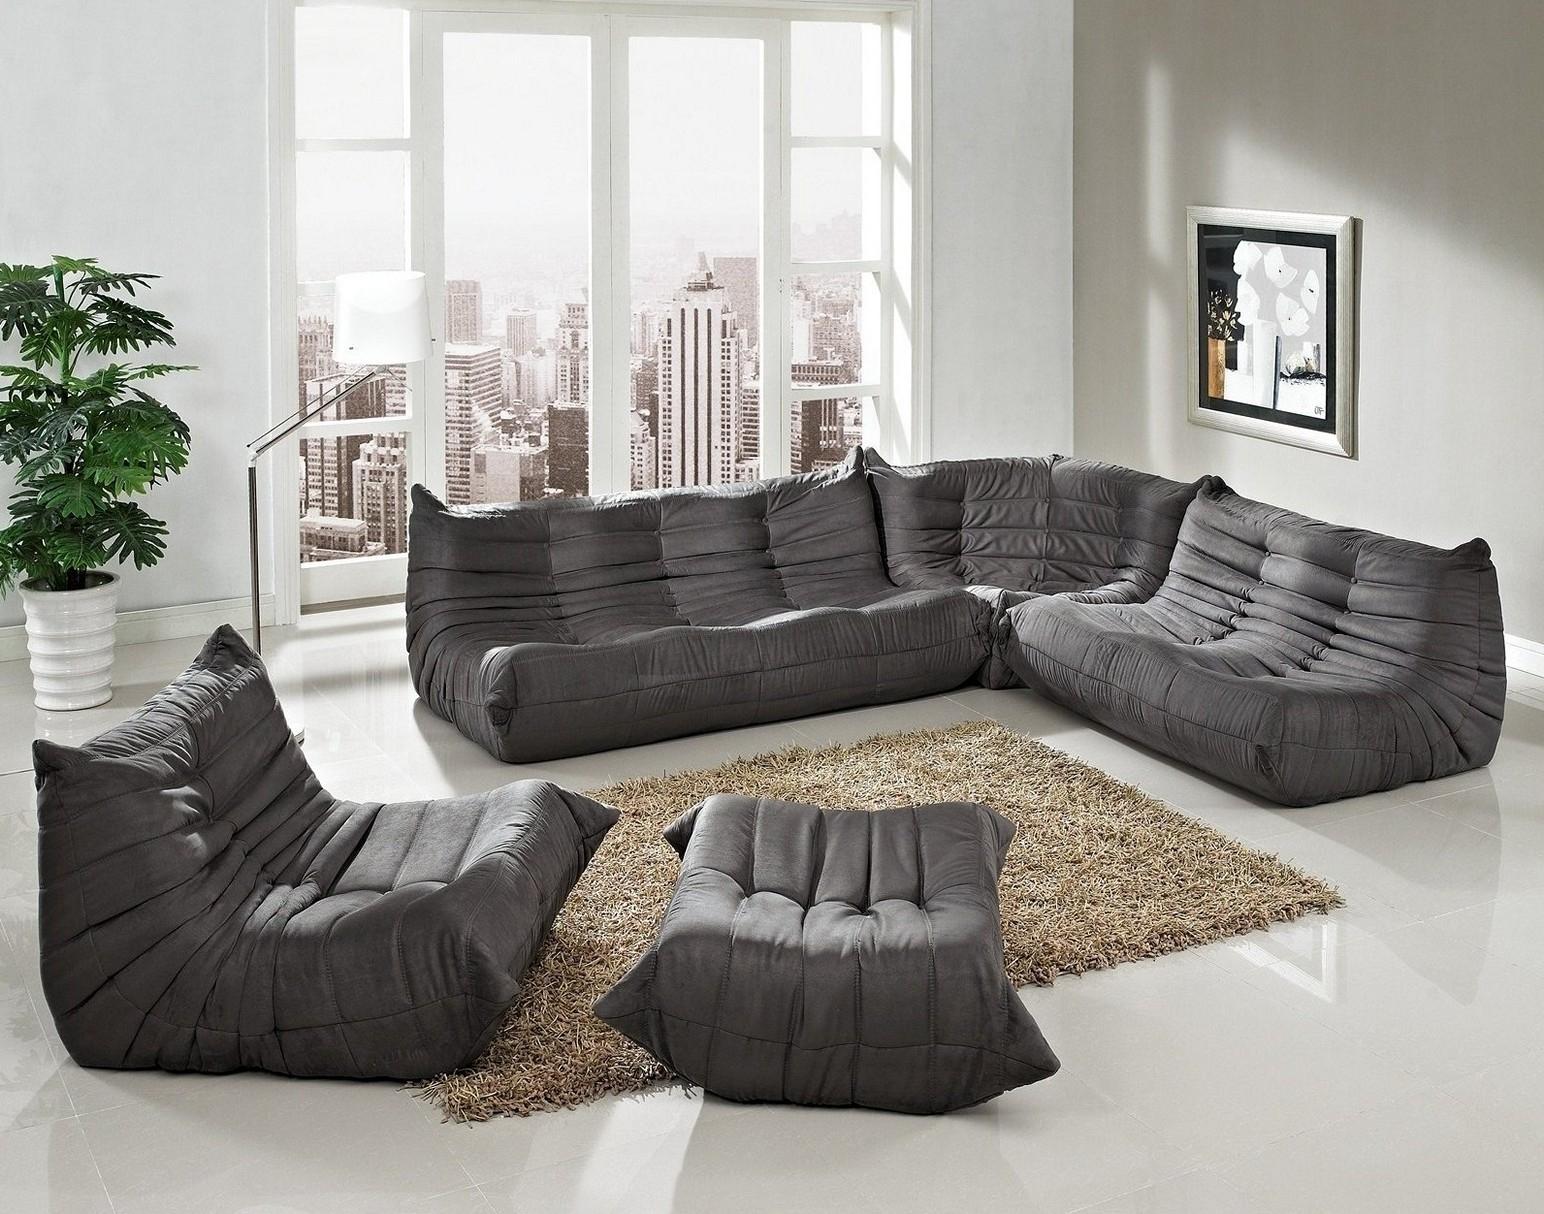 15 Ideas of Comfortable Floor Seating  Sofa Ideas